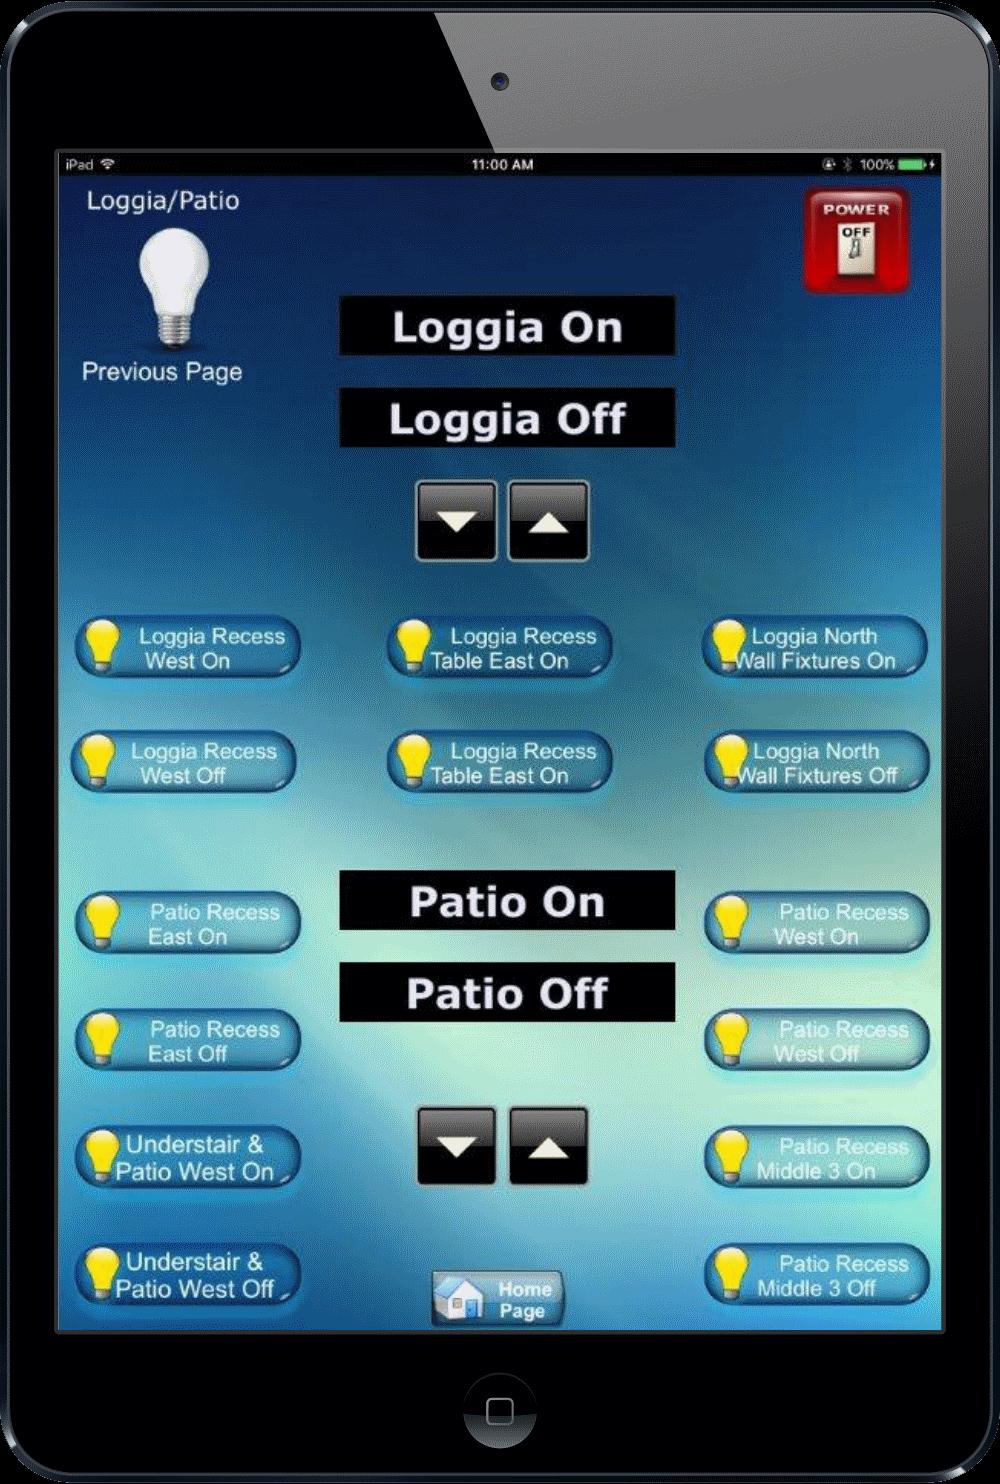 Ipad Mini Remote - Whole House Light Control 5.png